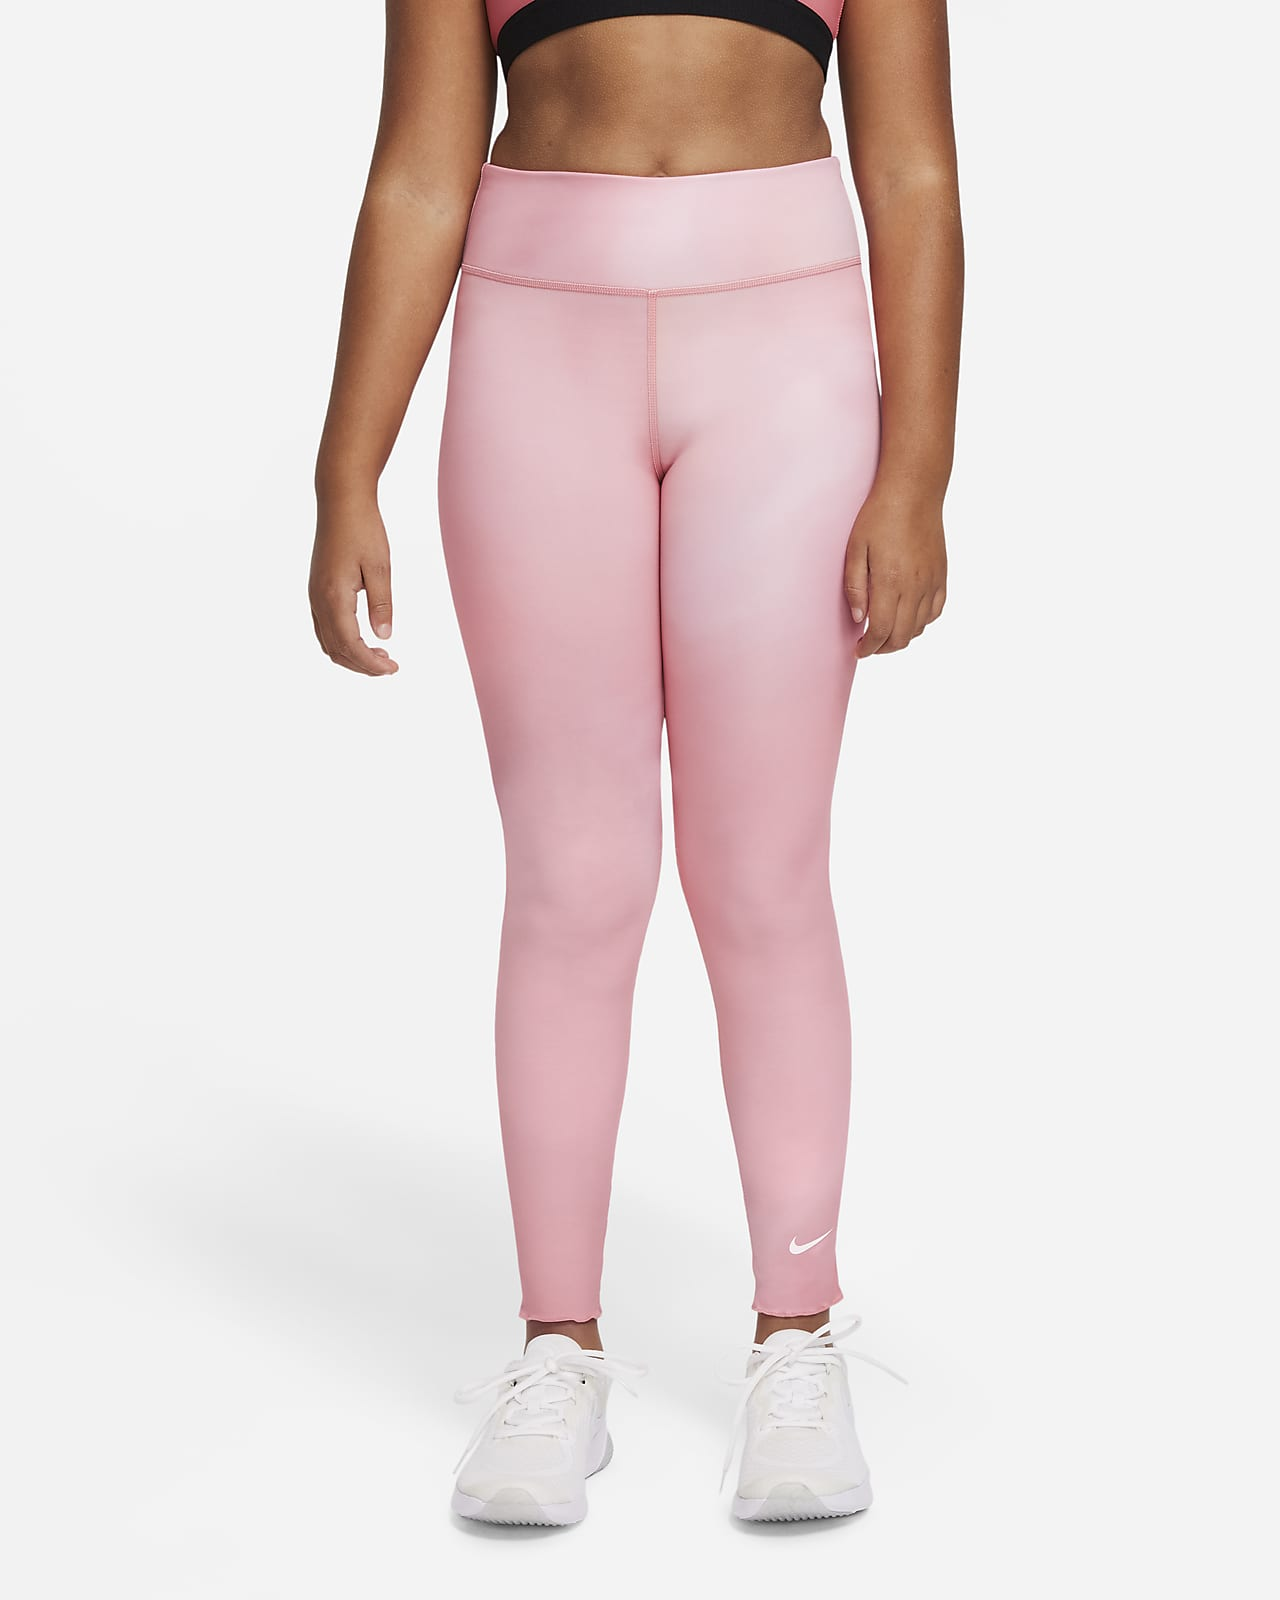 Nike Dri-FIT One Big Kids' (Girls') Printed Training Tights